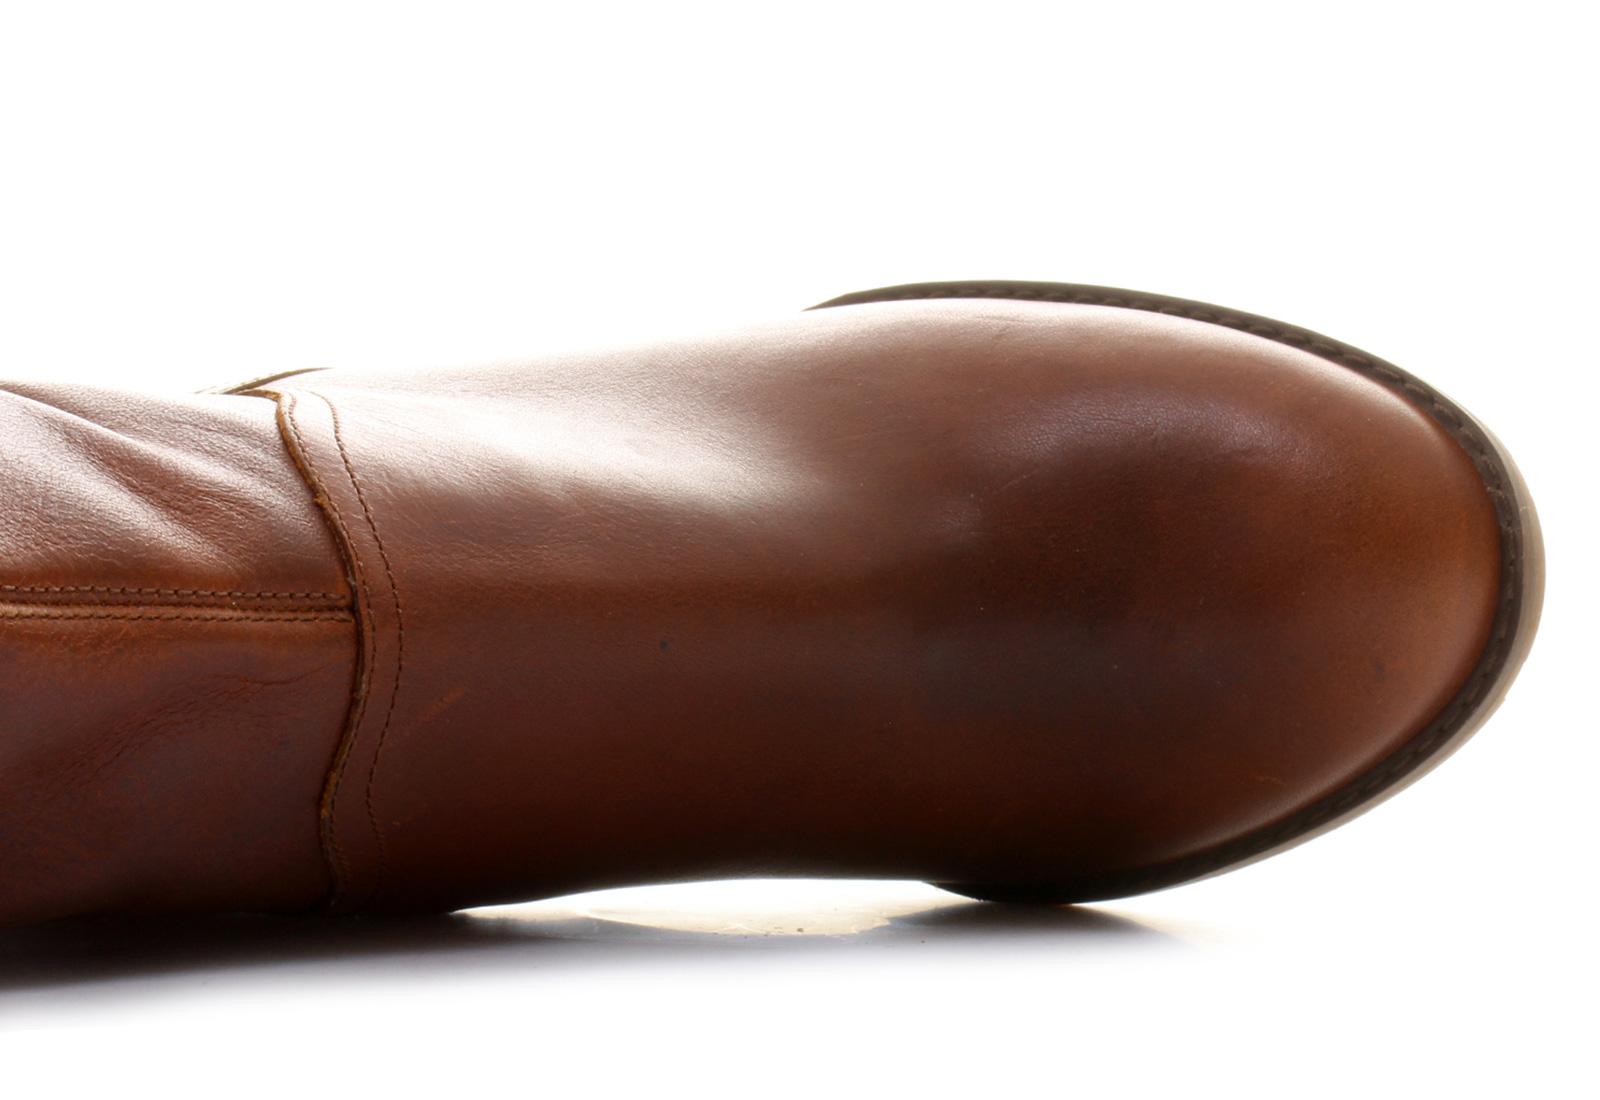 Timberland Kozačky - Stratham Heights Tall Boot - 8611A-BRNTenisky ... 392faace4f